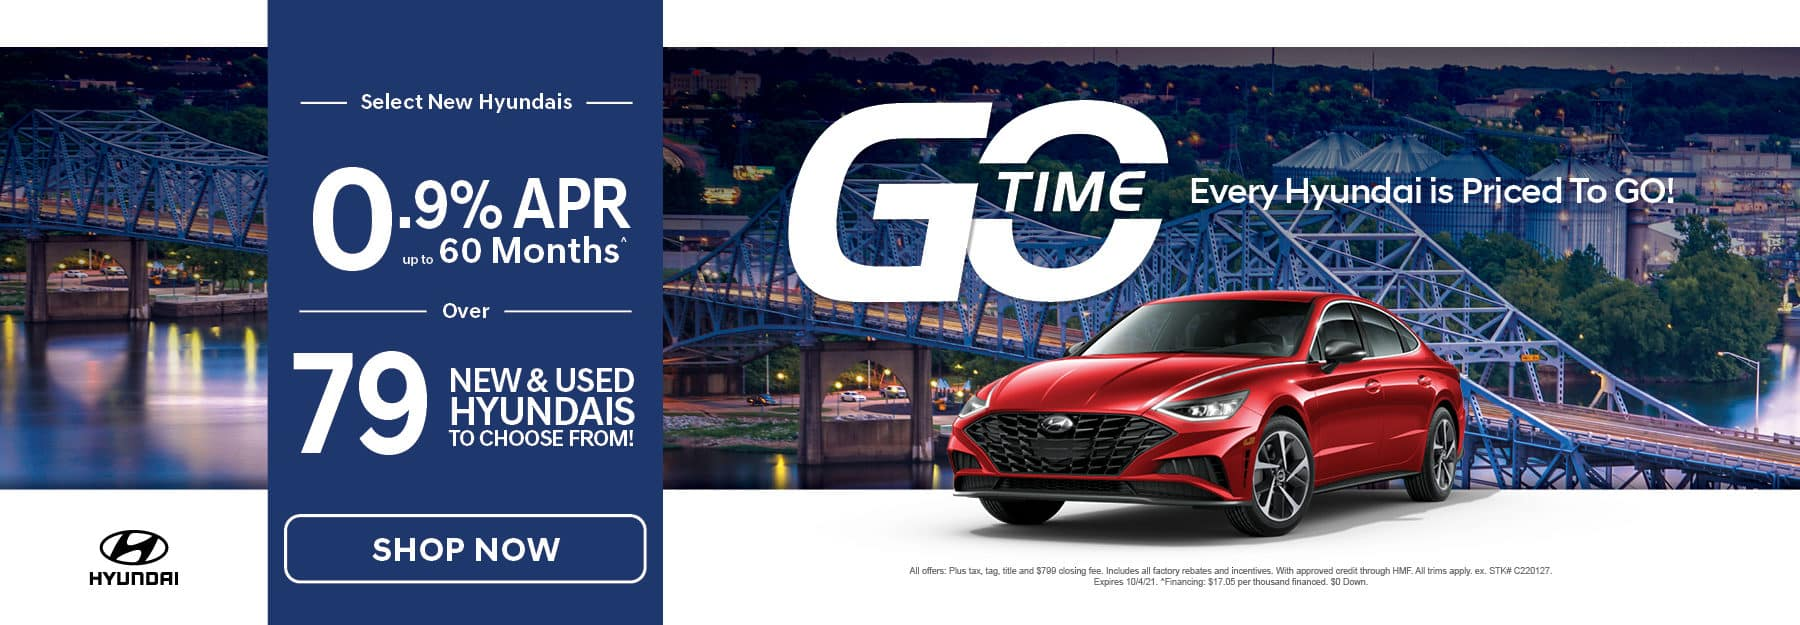 Go Time - New Hyundai Vehicles